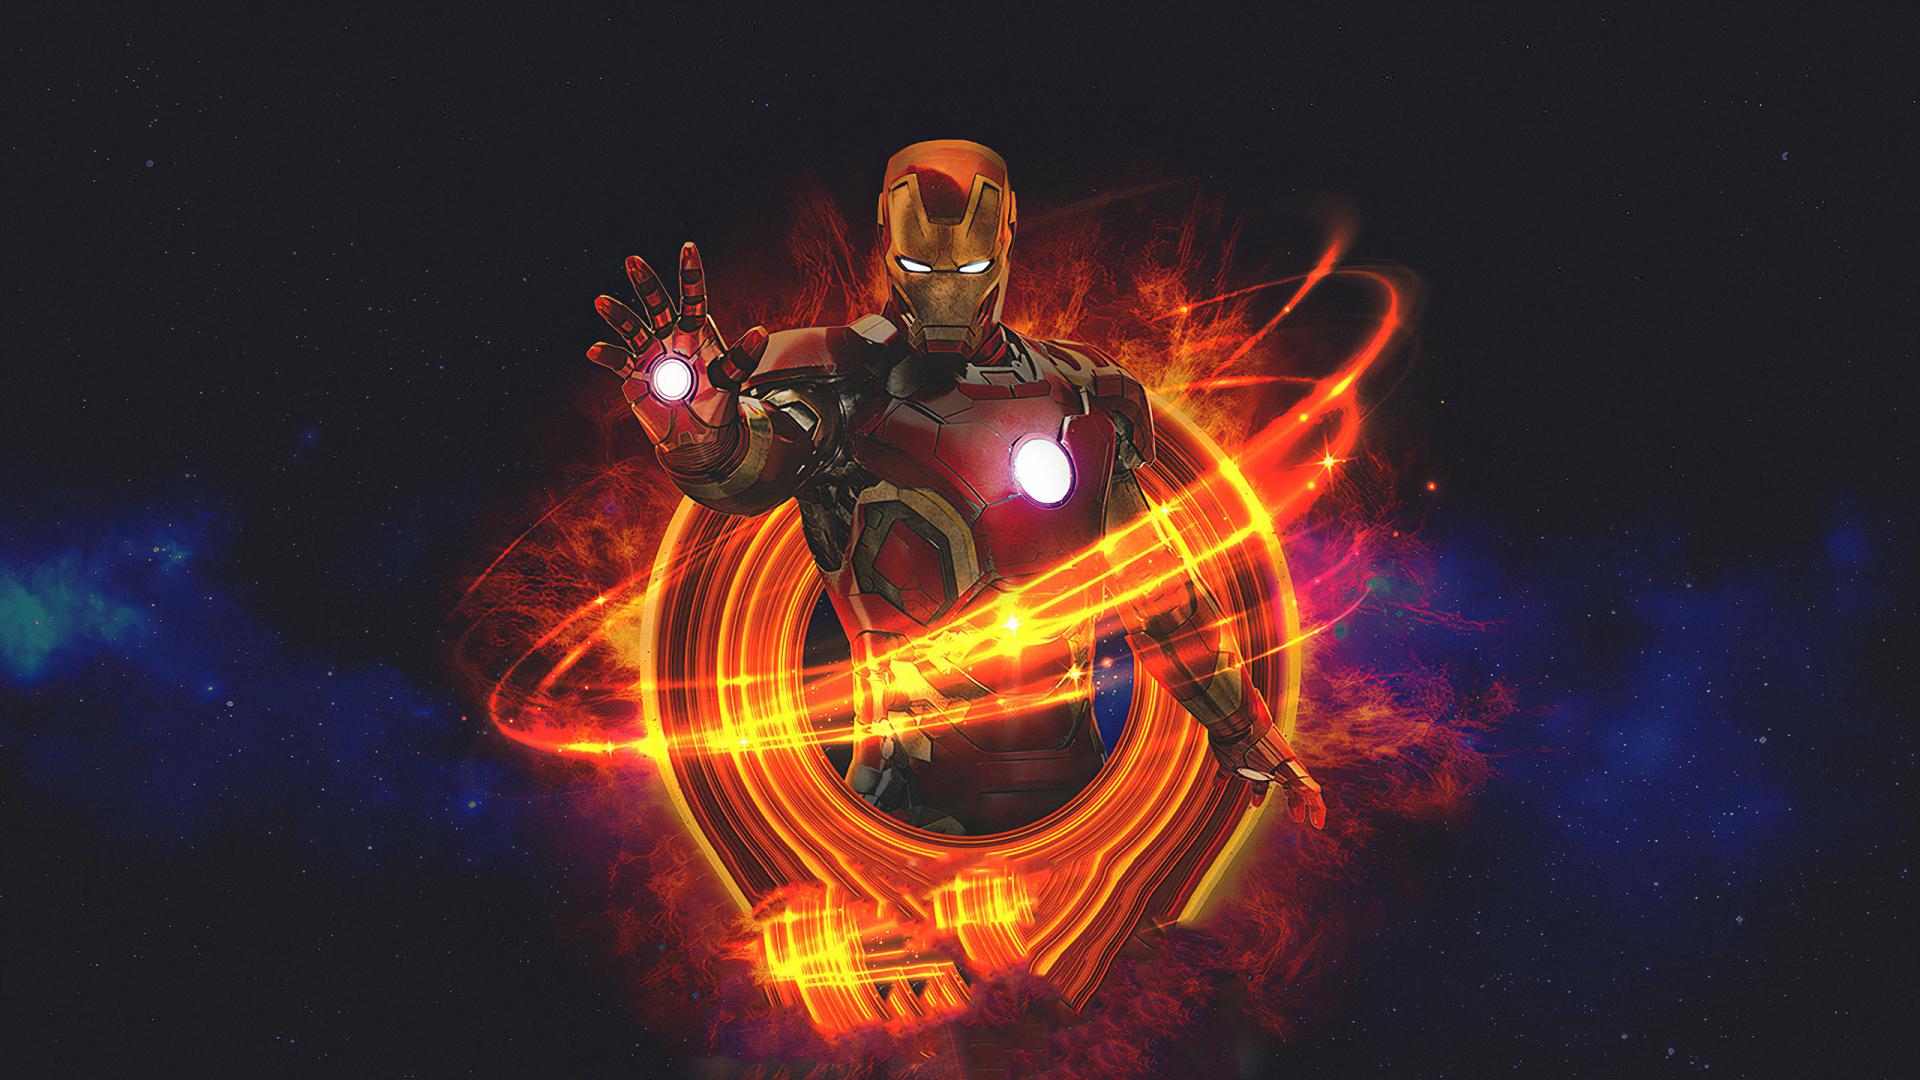 1920x1080 Marvel Iron Man Art 1080P Laptop Full HD ...